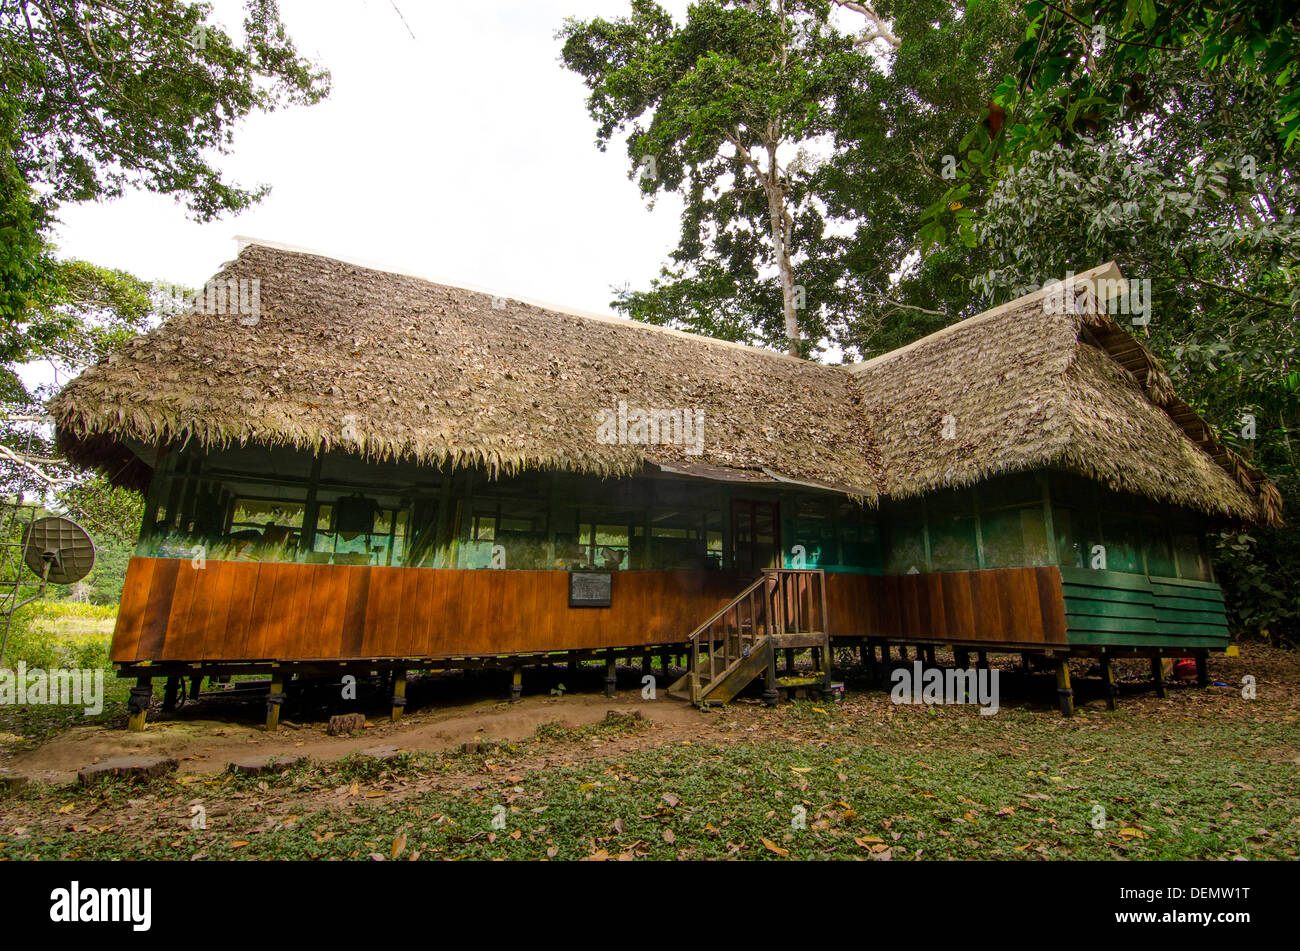 Cocha Cashu Biological Research Station, Manu National Park, Peru - Stock Image